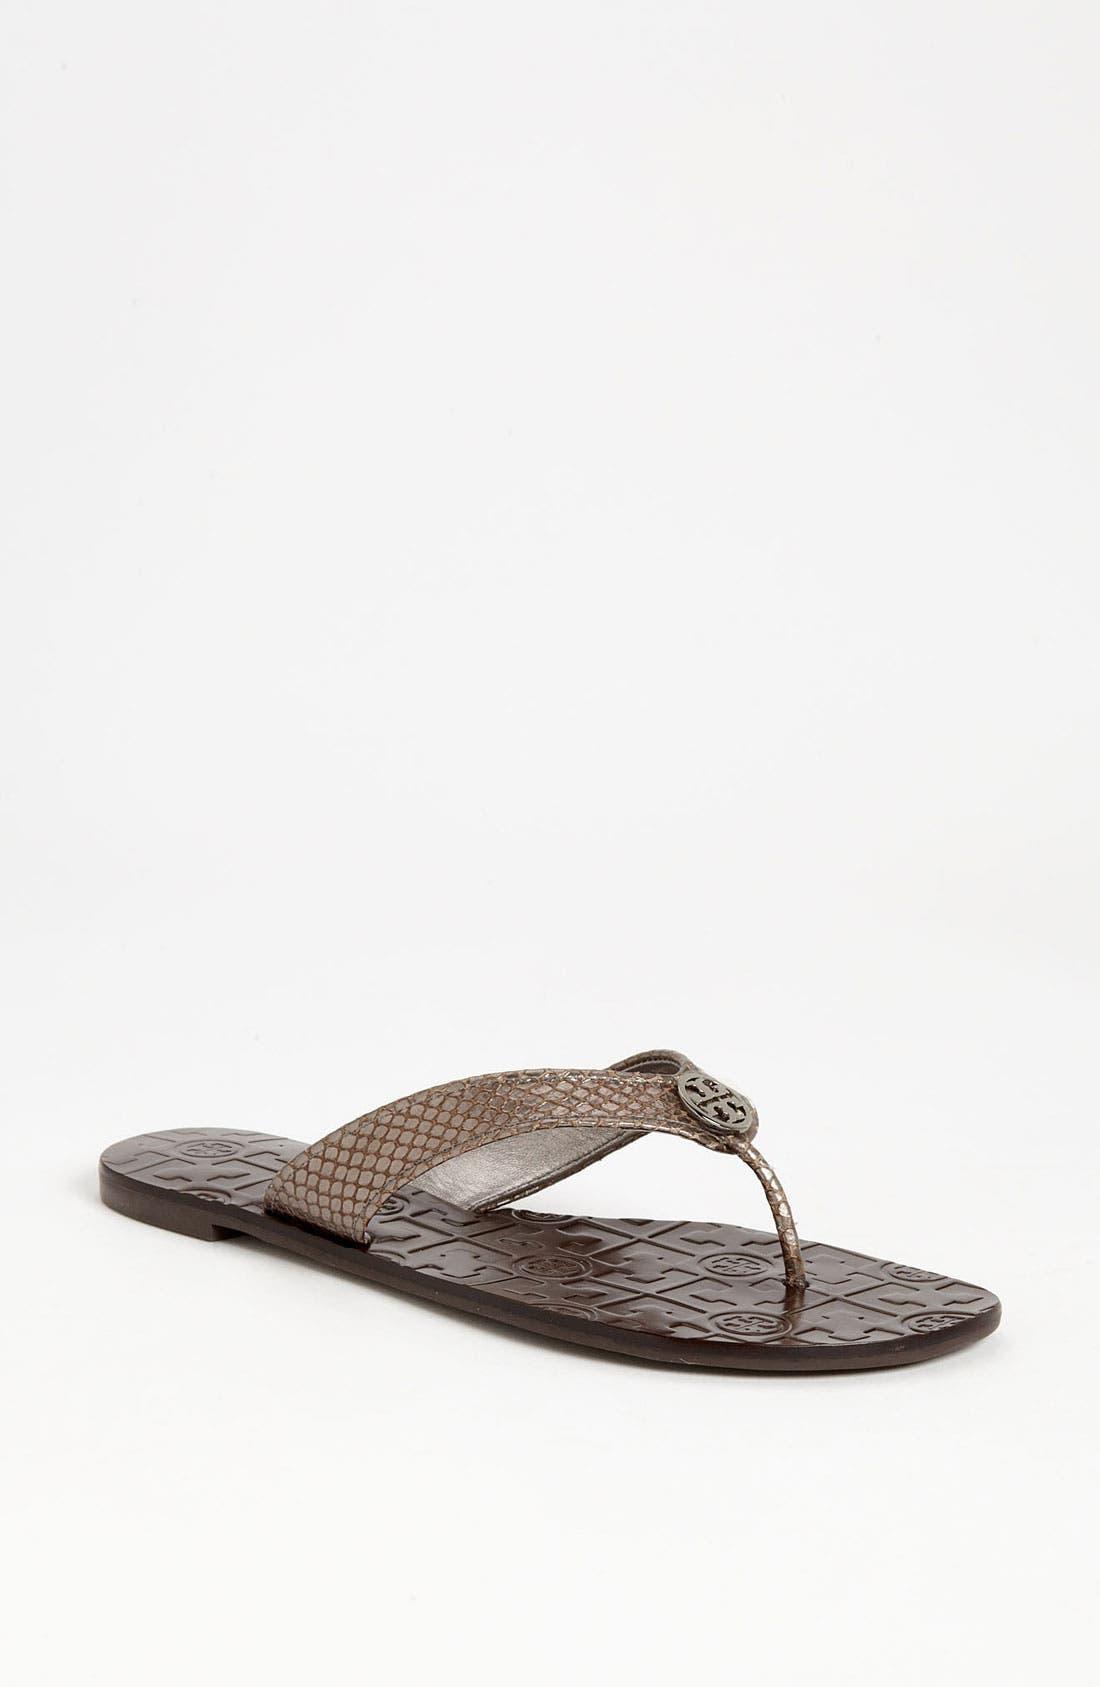 Main Image - Tory Burch 'Thora 2' Sandal